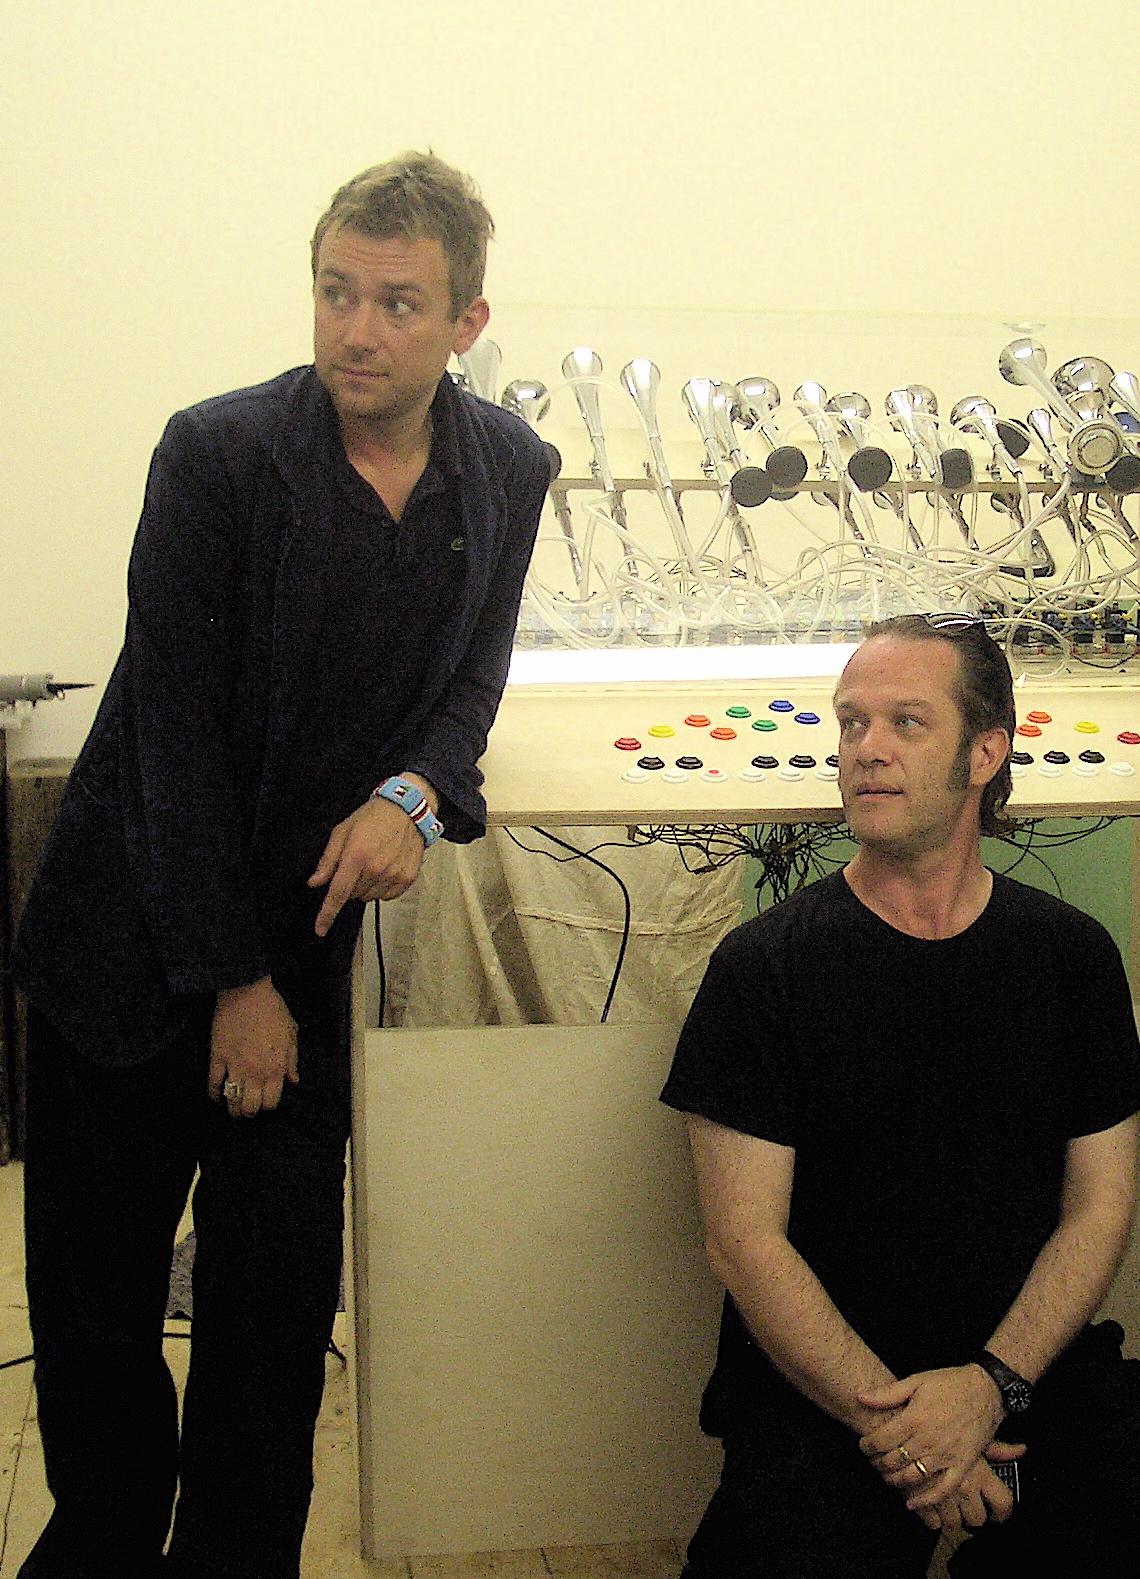 With Damon Albarn, London, March 2006